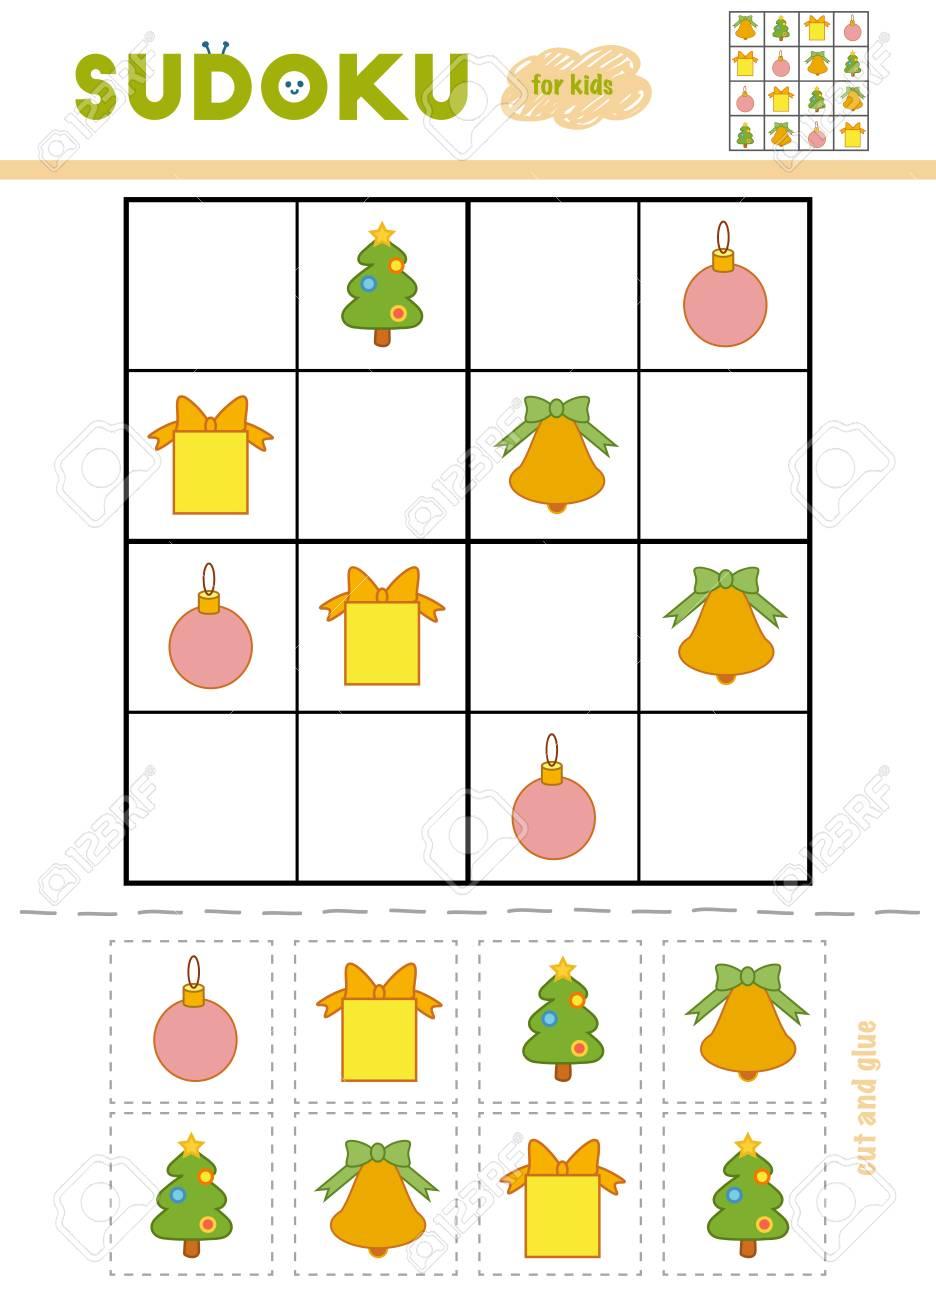 Christmas Sudoku.Sudoku For Children Education Game Cartoon Christmas Objects